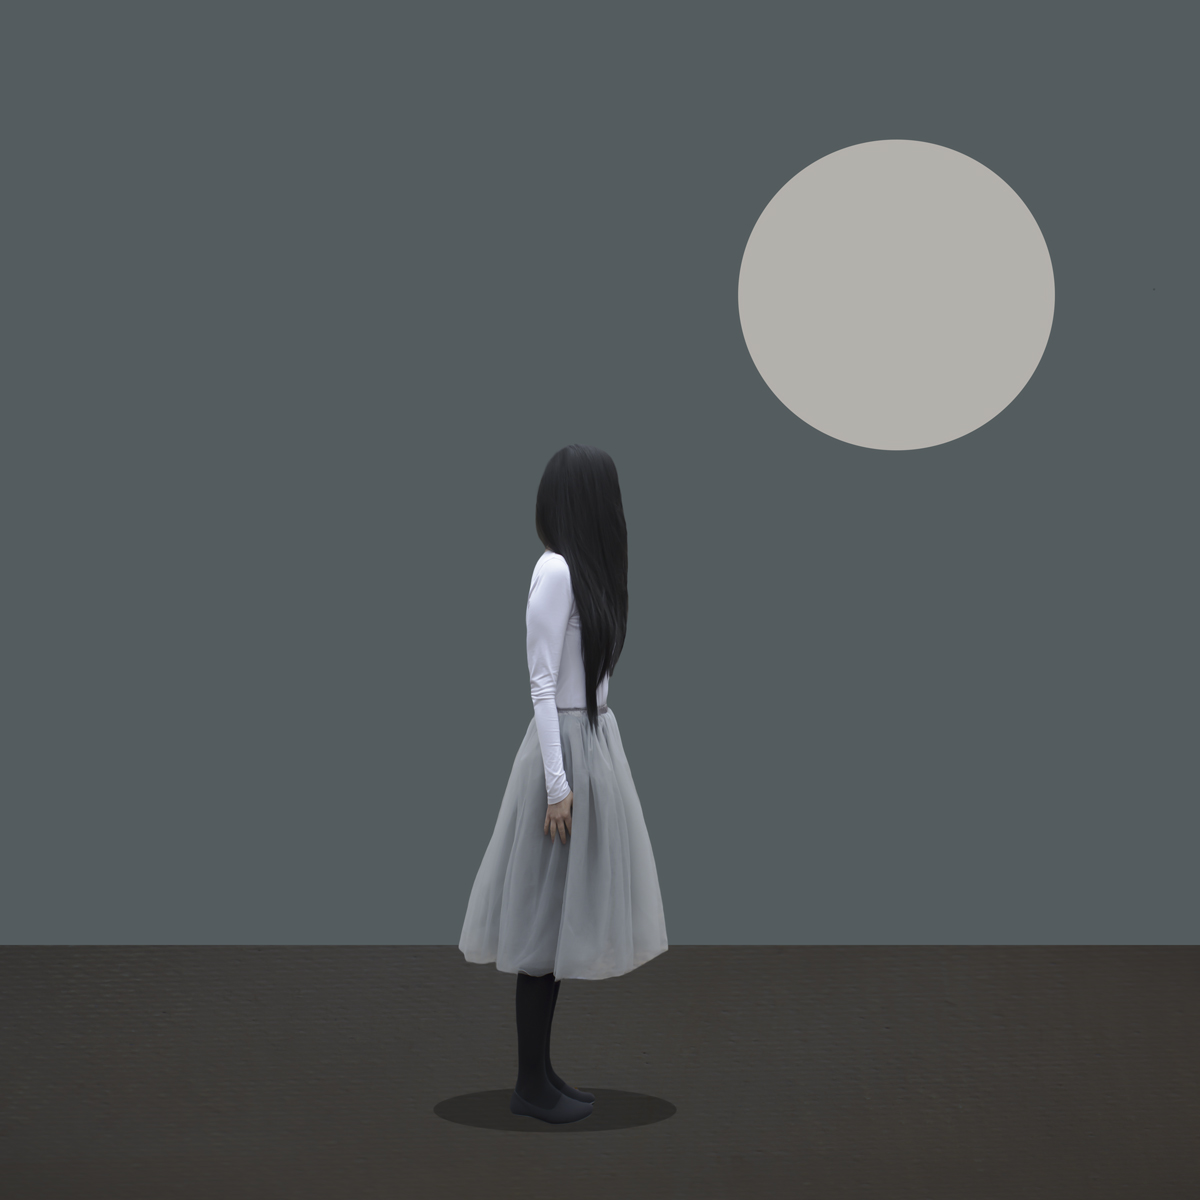 Patty  Maher_The Silvery Moon.jpg